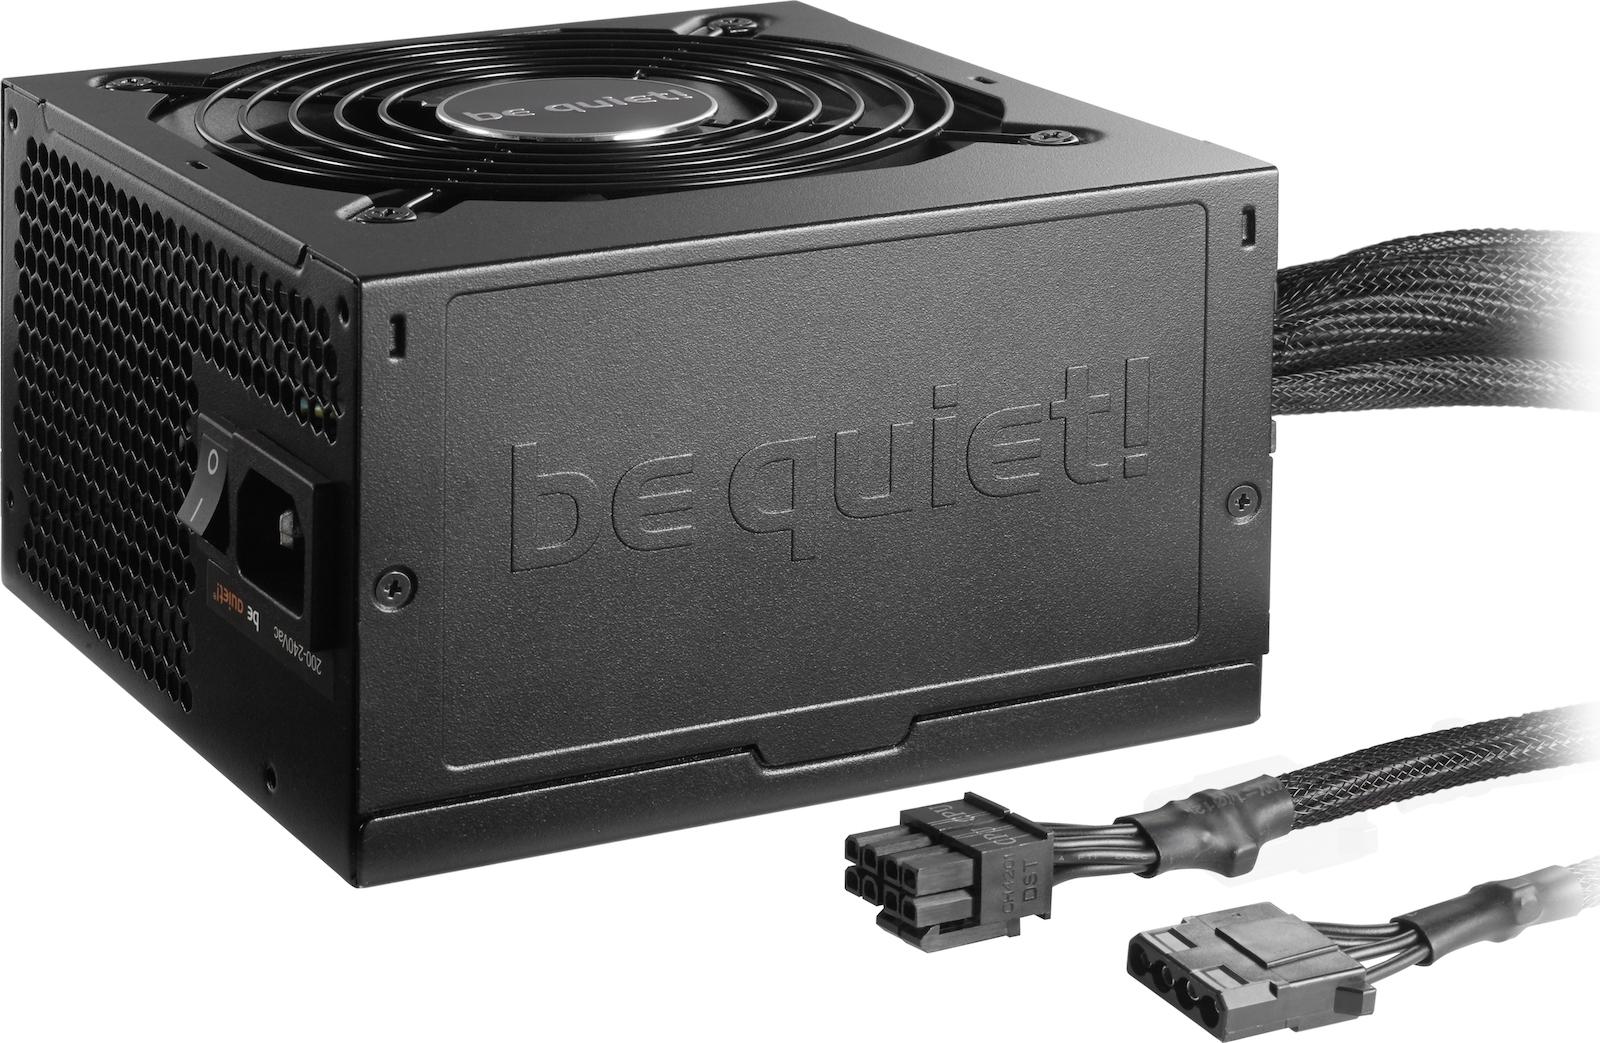 Be Quiet System Power 9 600W BN247 Τροφοδοτικό